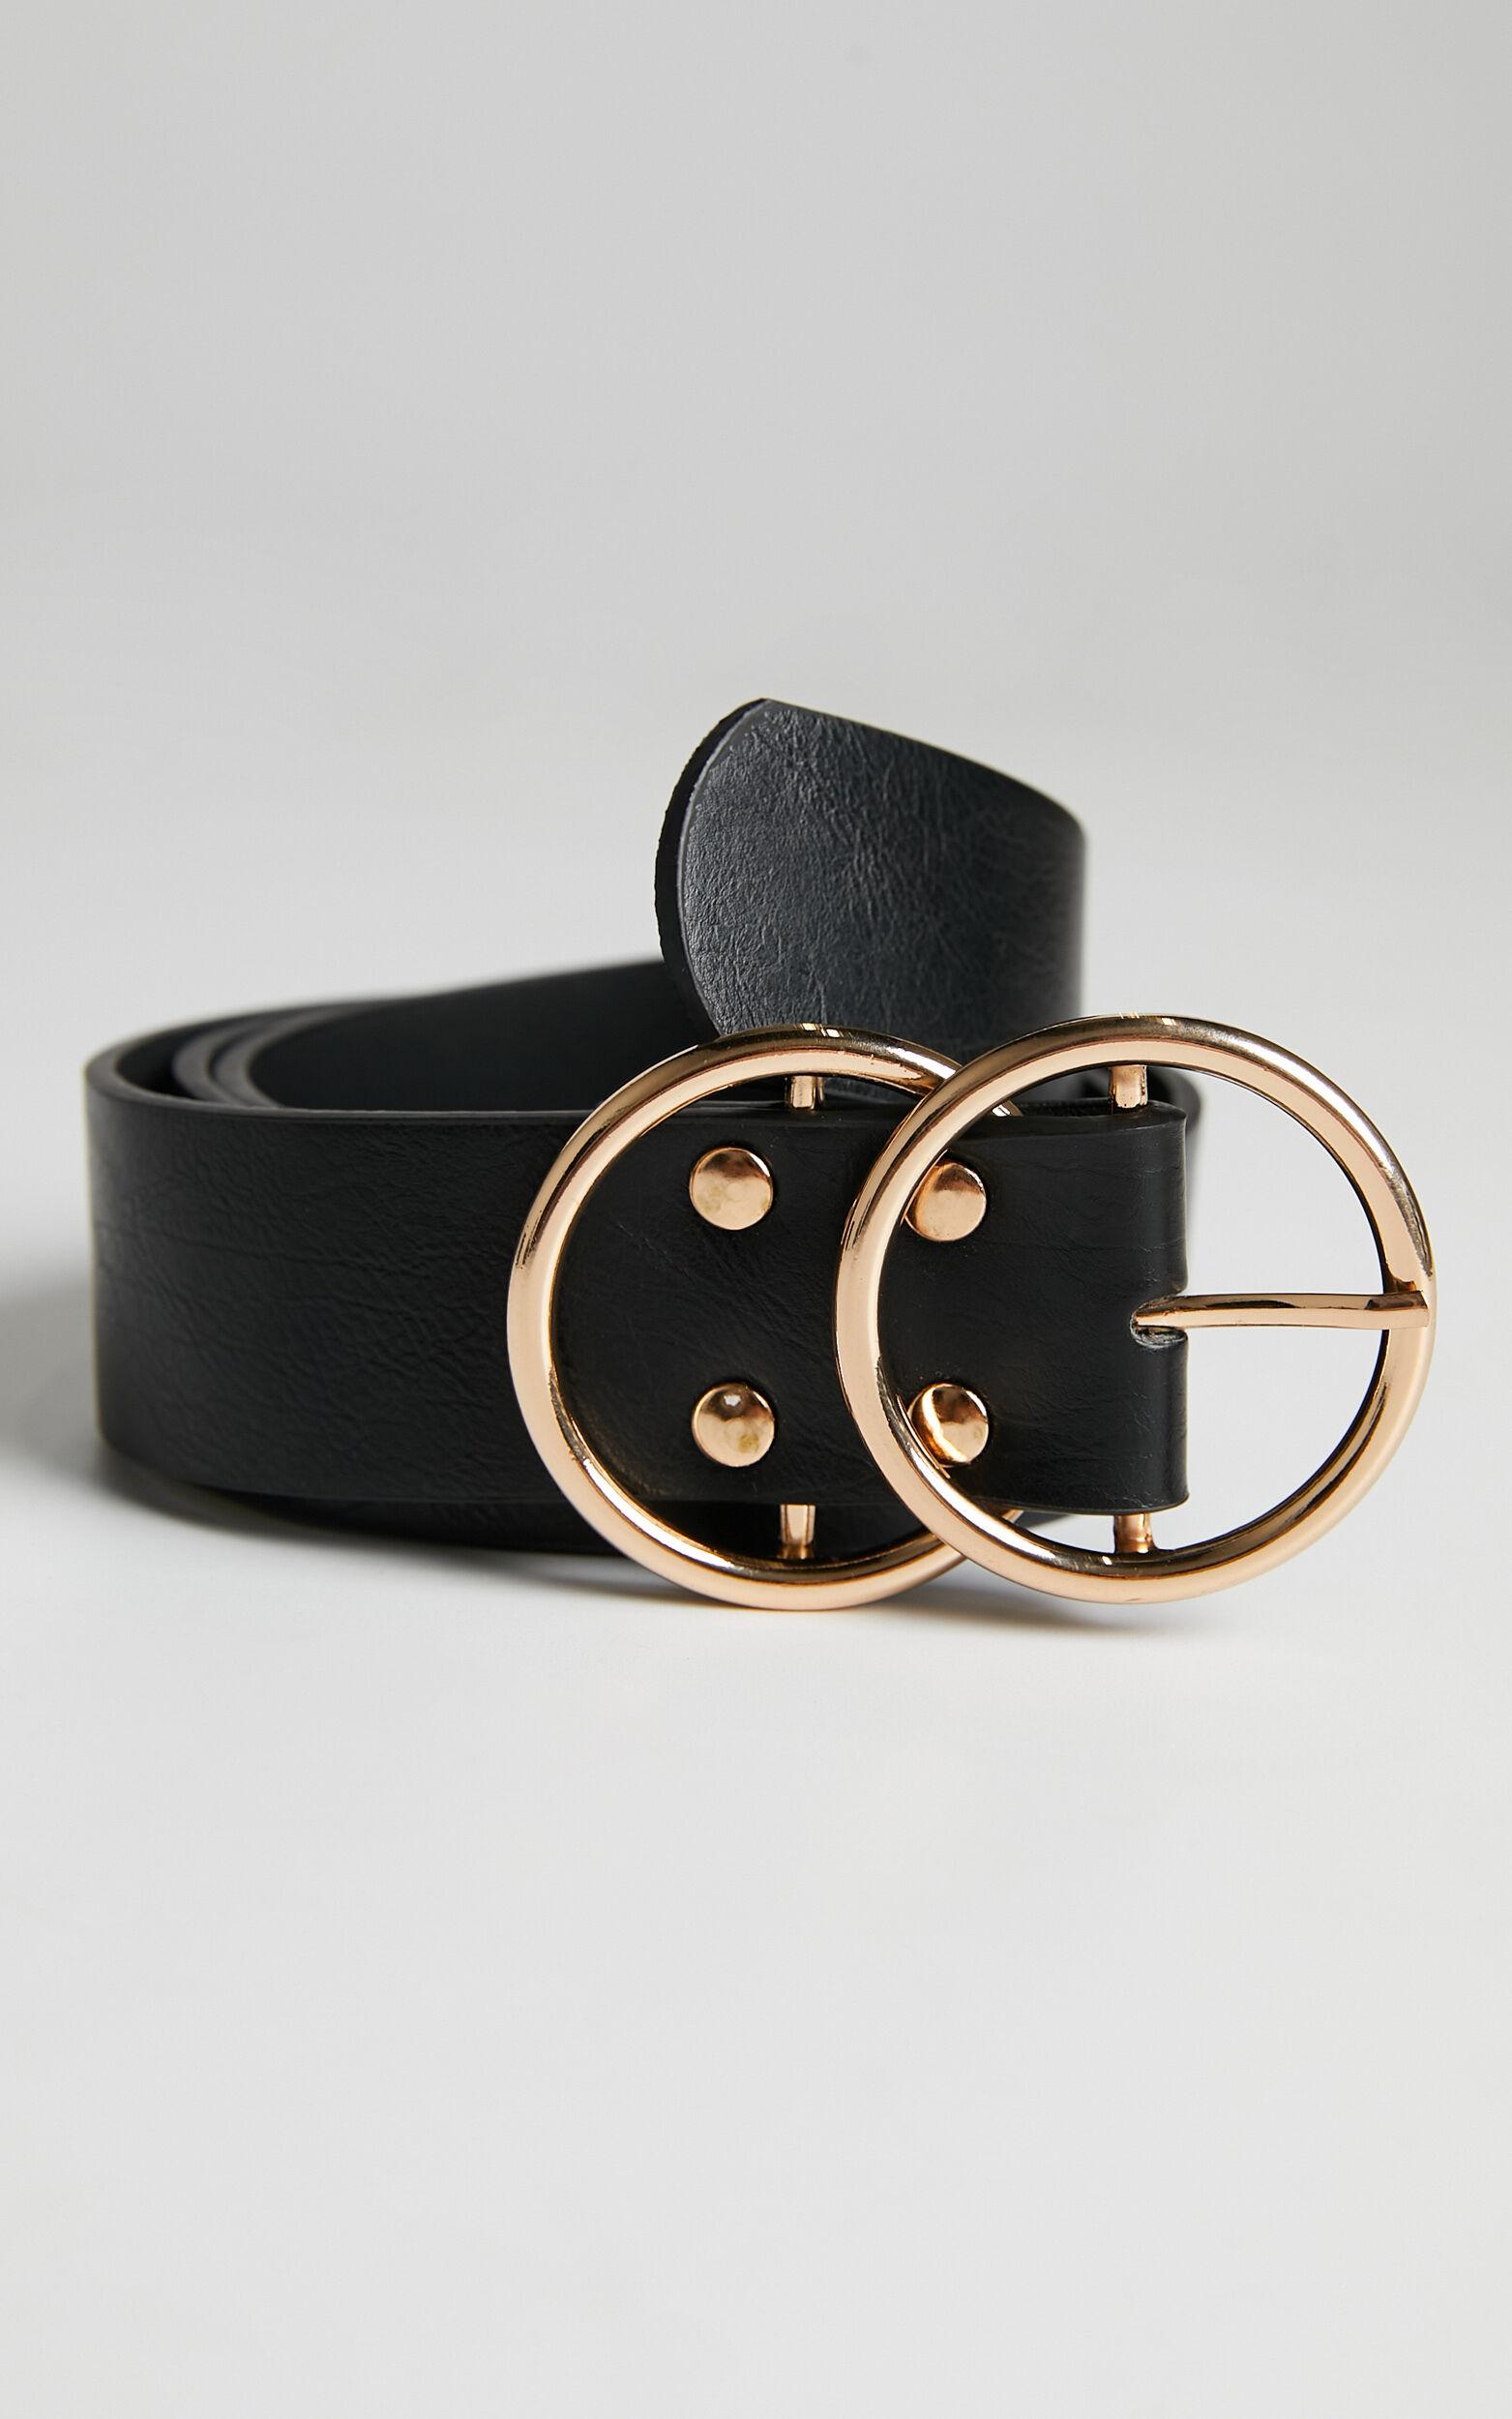 Midnight Charm Belt in Black And Gold Croc, BLK1, super-hi-res image number null